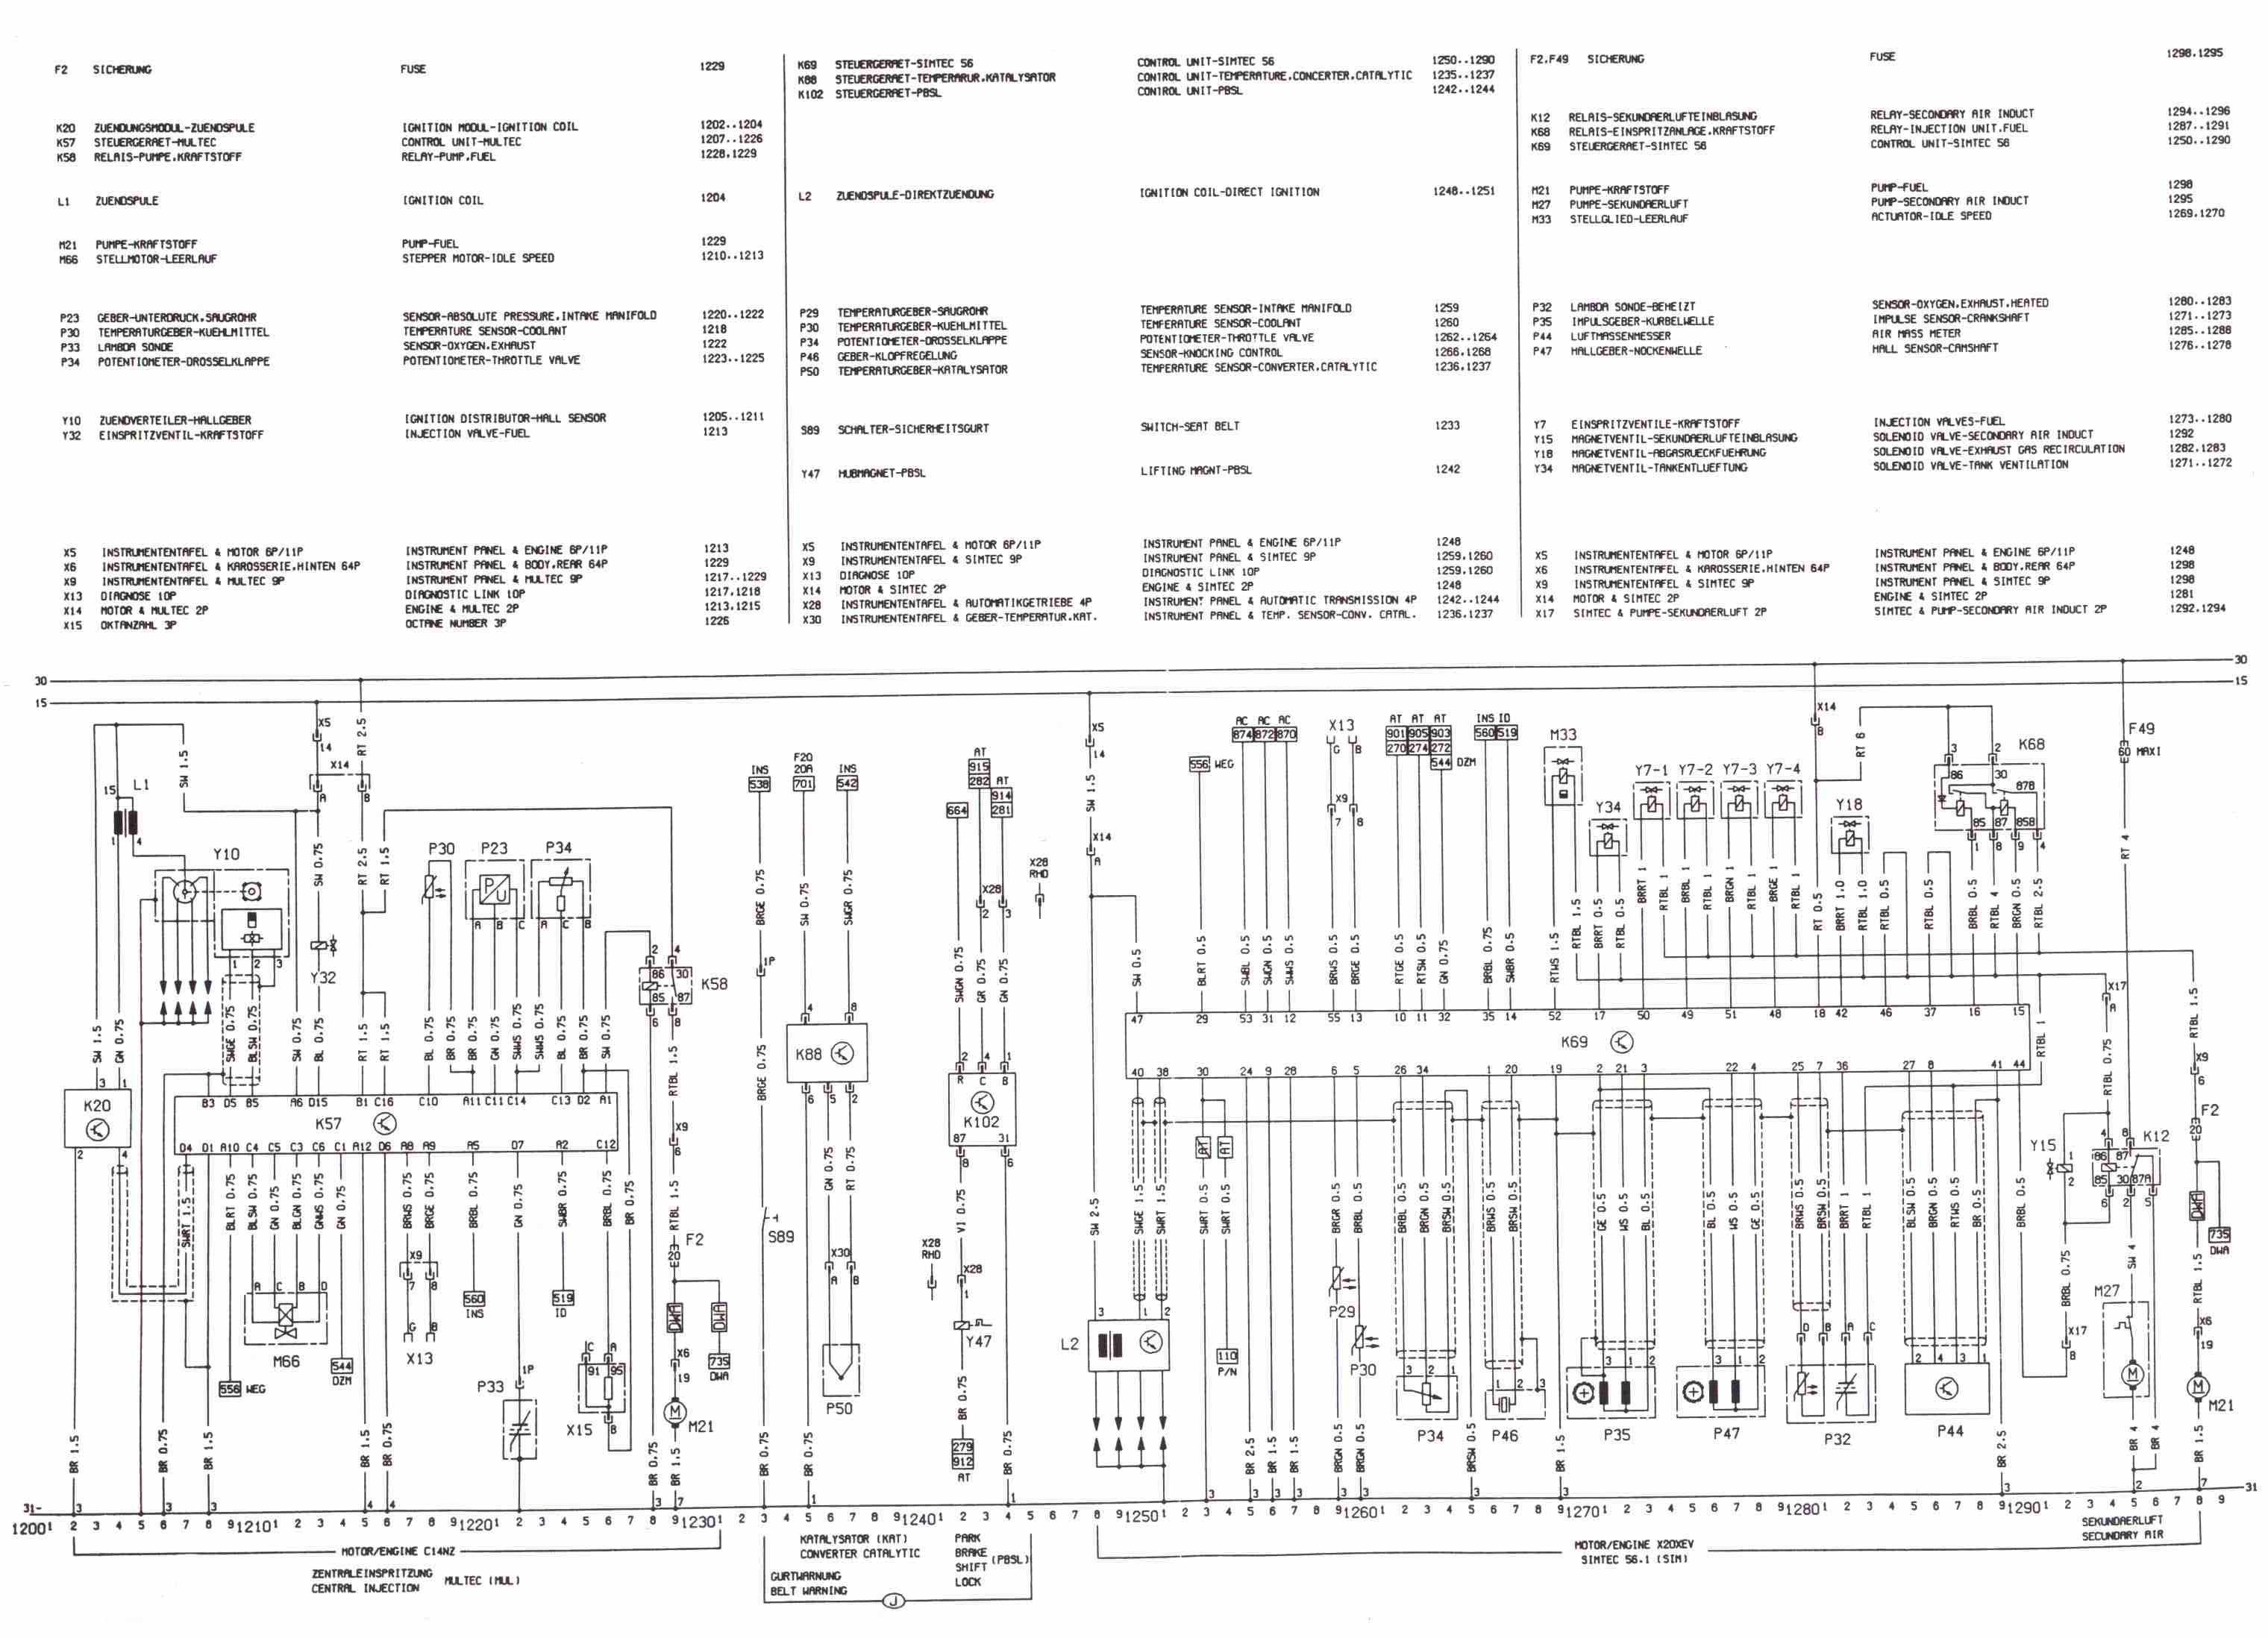 hd wallpapers wiring diagram zafira z18xe wallhdiii ga rh wallhdiii ga Ecotec Engine GM 122 Engine